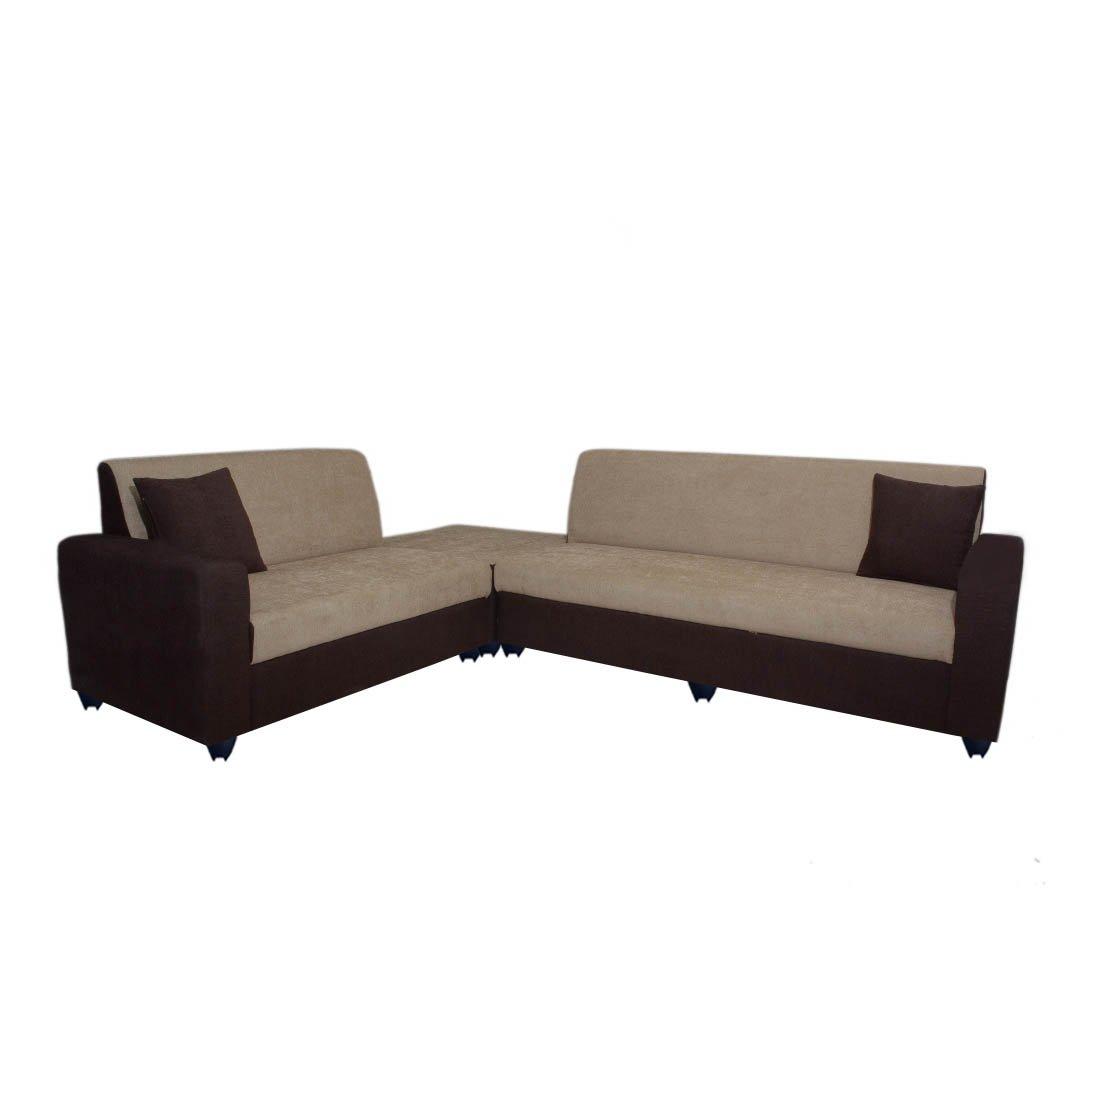 Excellent Bharat Lifestyle Cosmo Plus Fabric 6 Seater Finish Color Cream Brown Machost Co Dining Chair Design Ideas Machostcouk